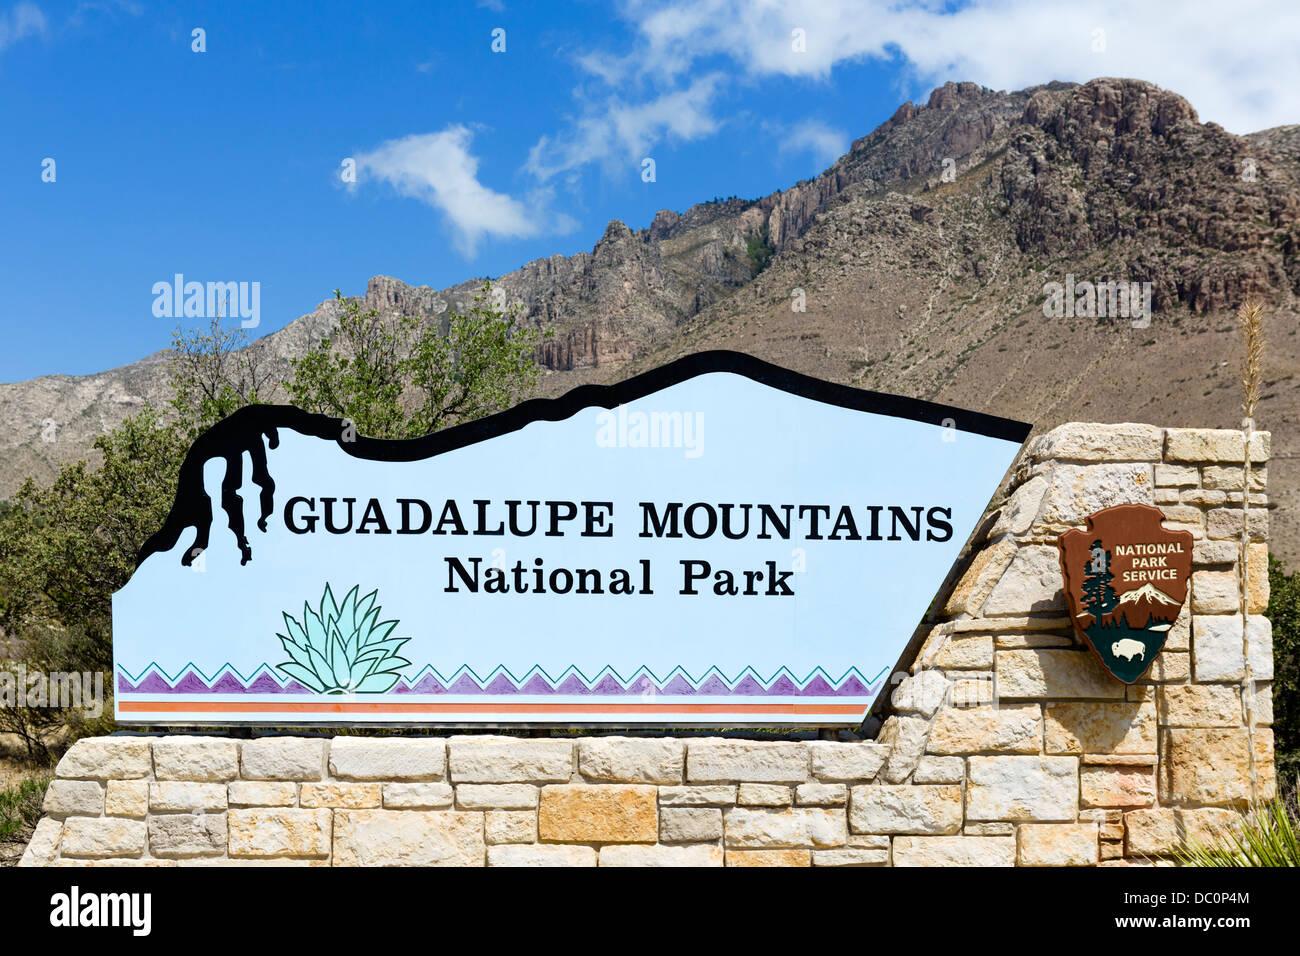 Entrée de la Guadalupe Mountains National Park, California, USA Photo Stock